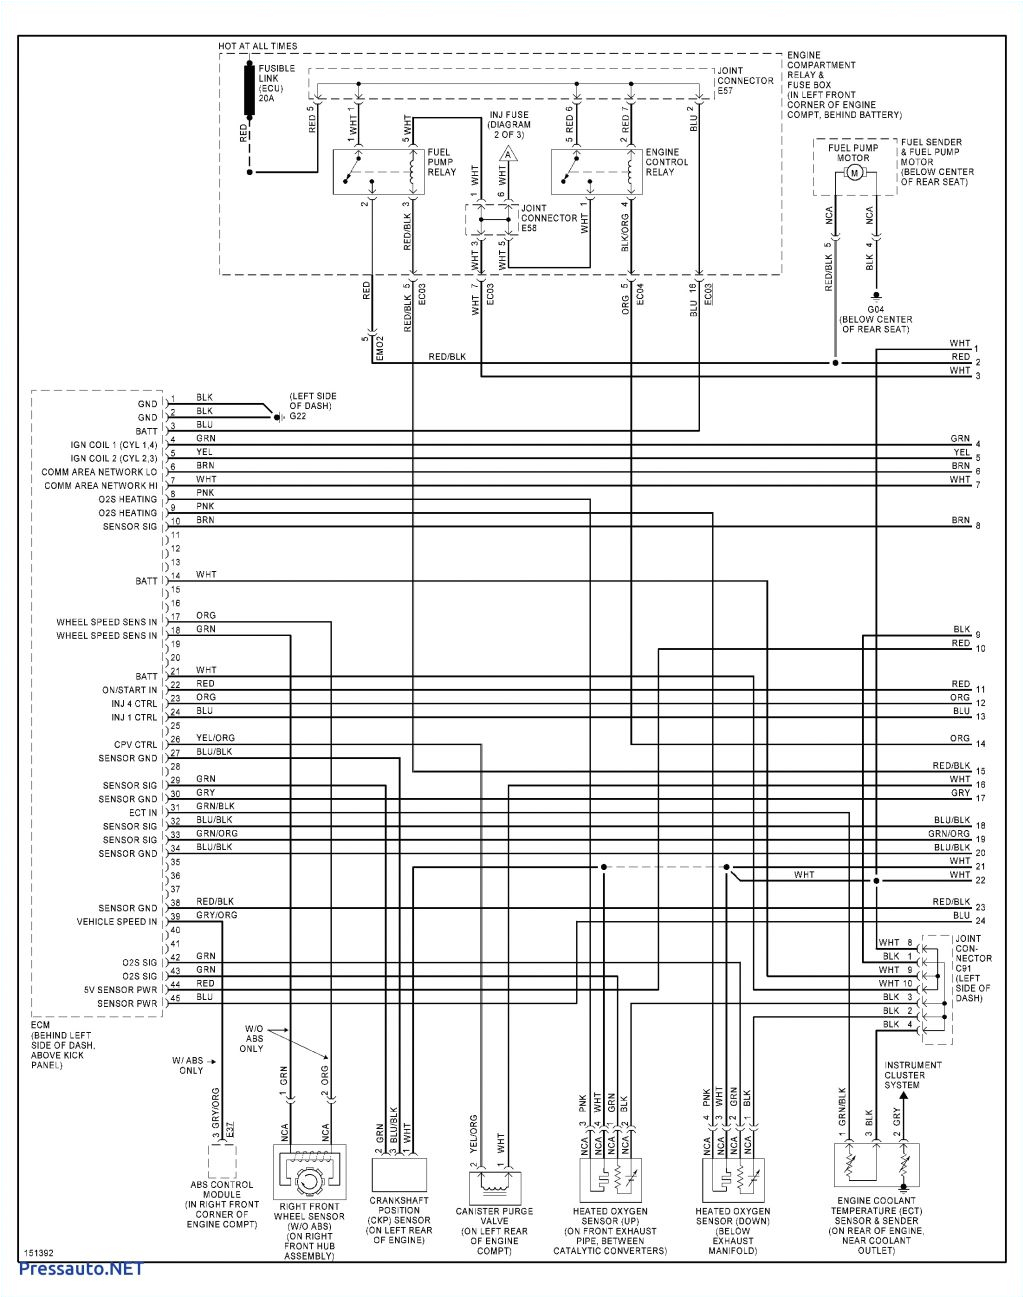 intelilite amf 25 wiring diagram new wiring diagram relb 2s40 n wiring diagram inspirational wiring